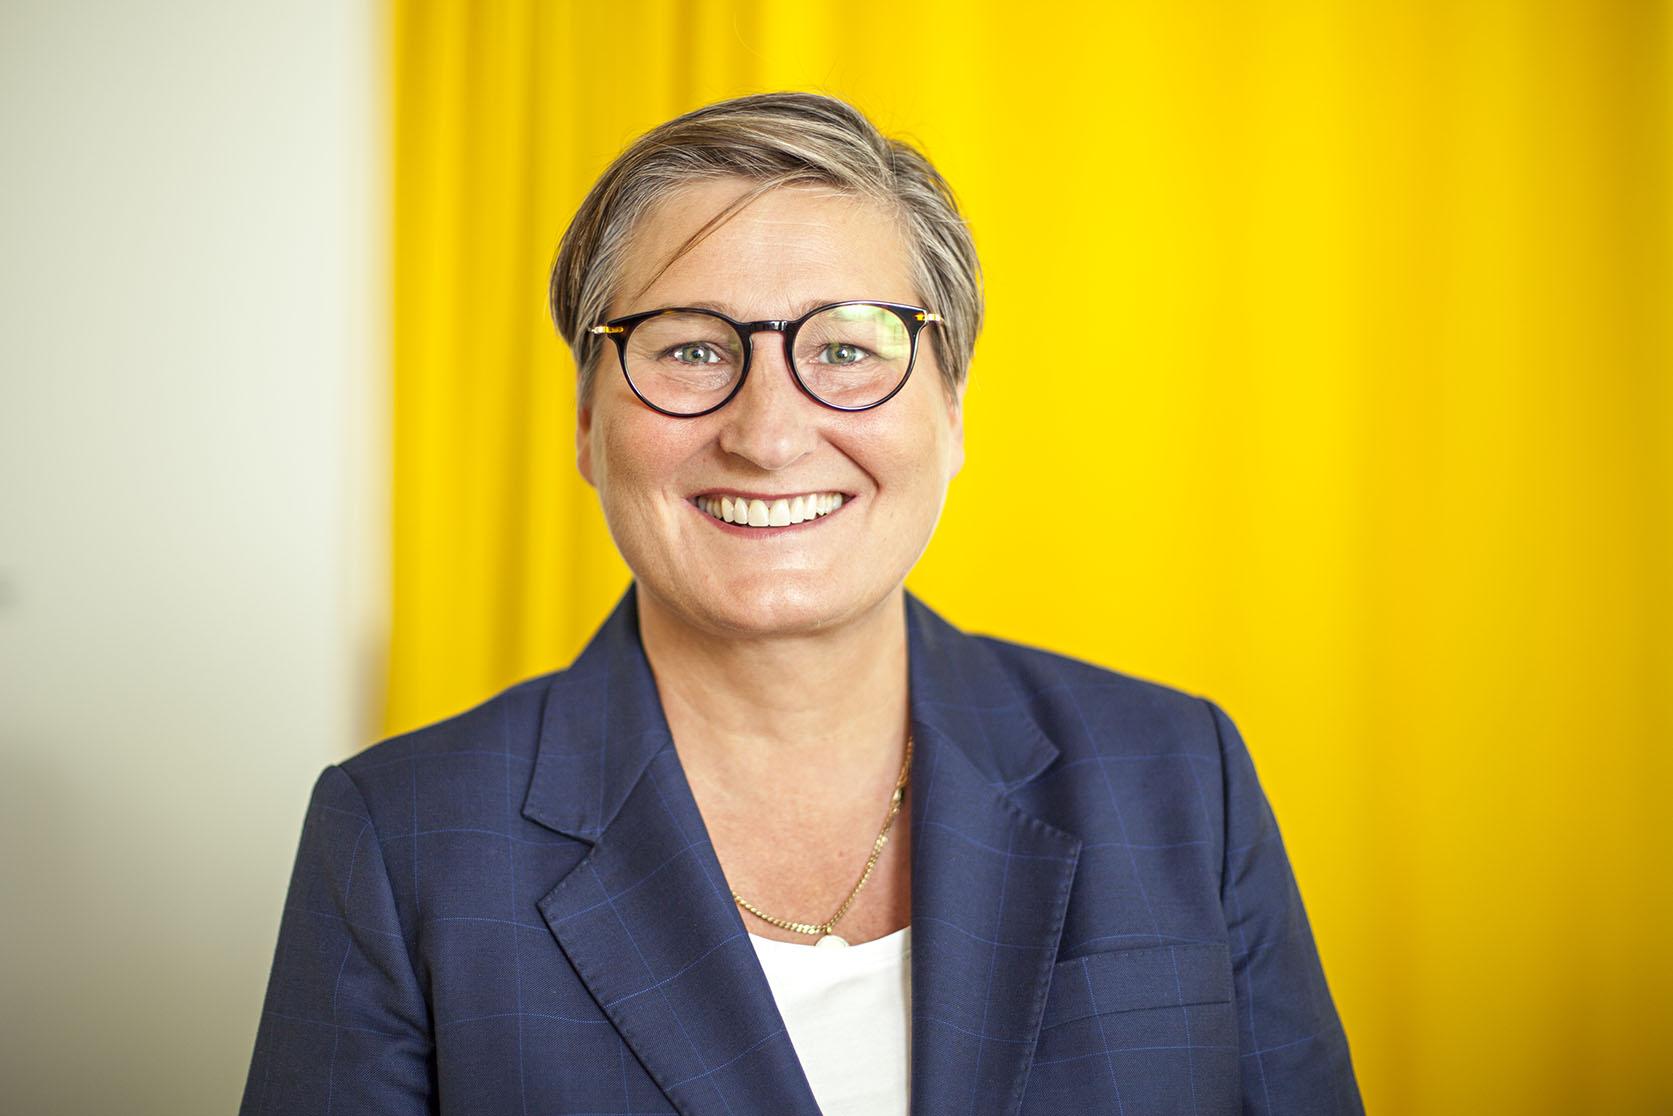 Tiina Helenius